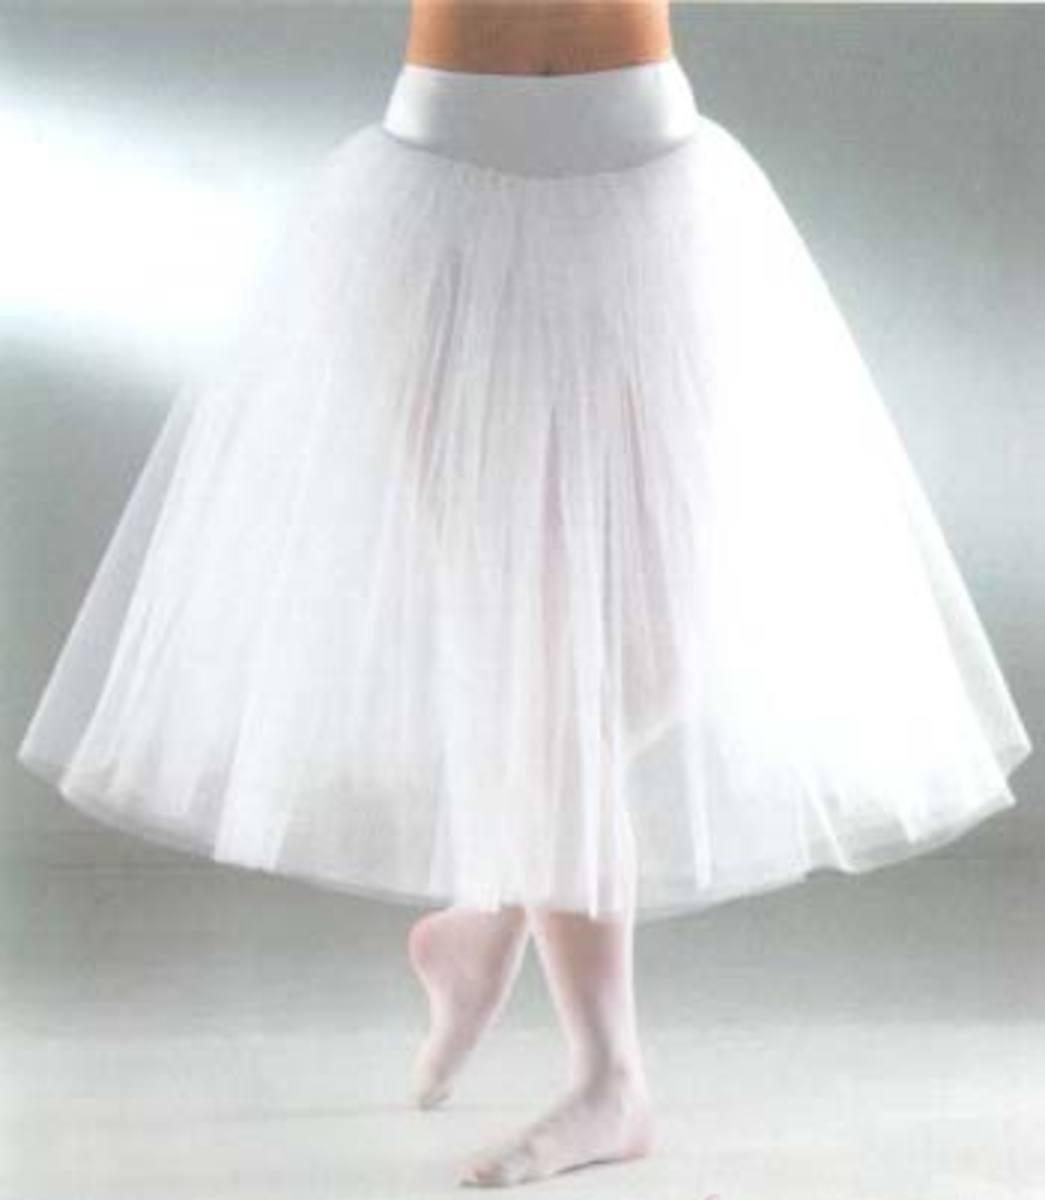 Read more.  Шьем пышную юбку для девочки pettiskirt без выкроек.